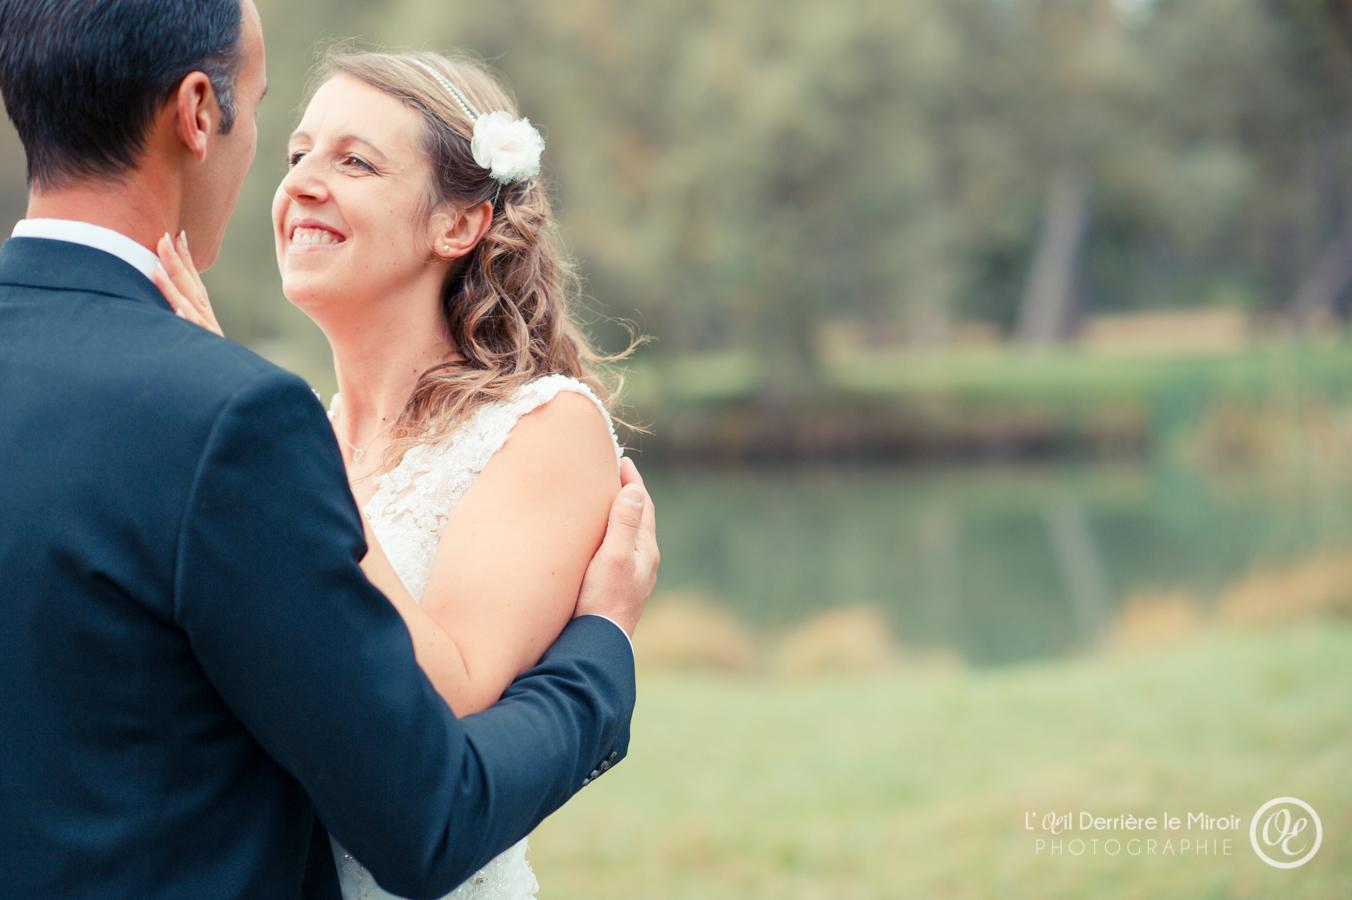 After-wedding-Audrey-Luis-loeilderrierelemiroir-17